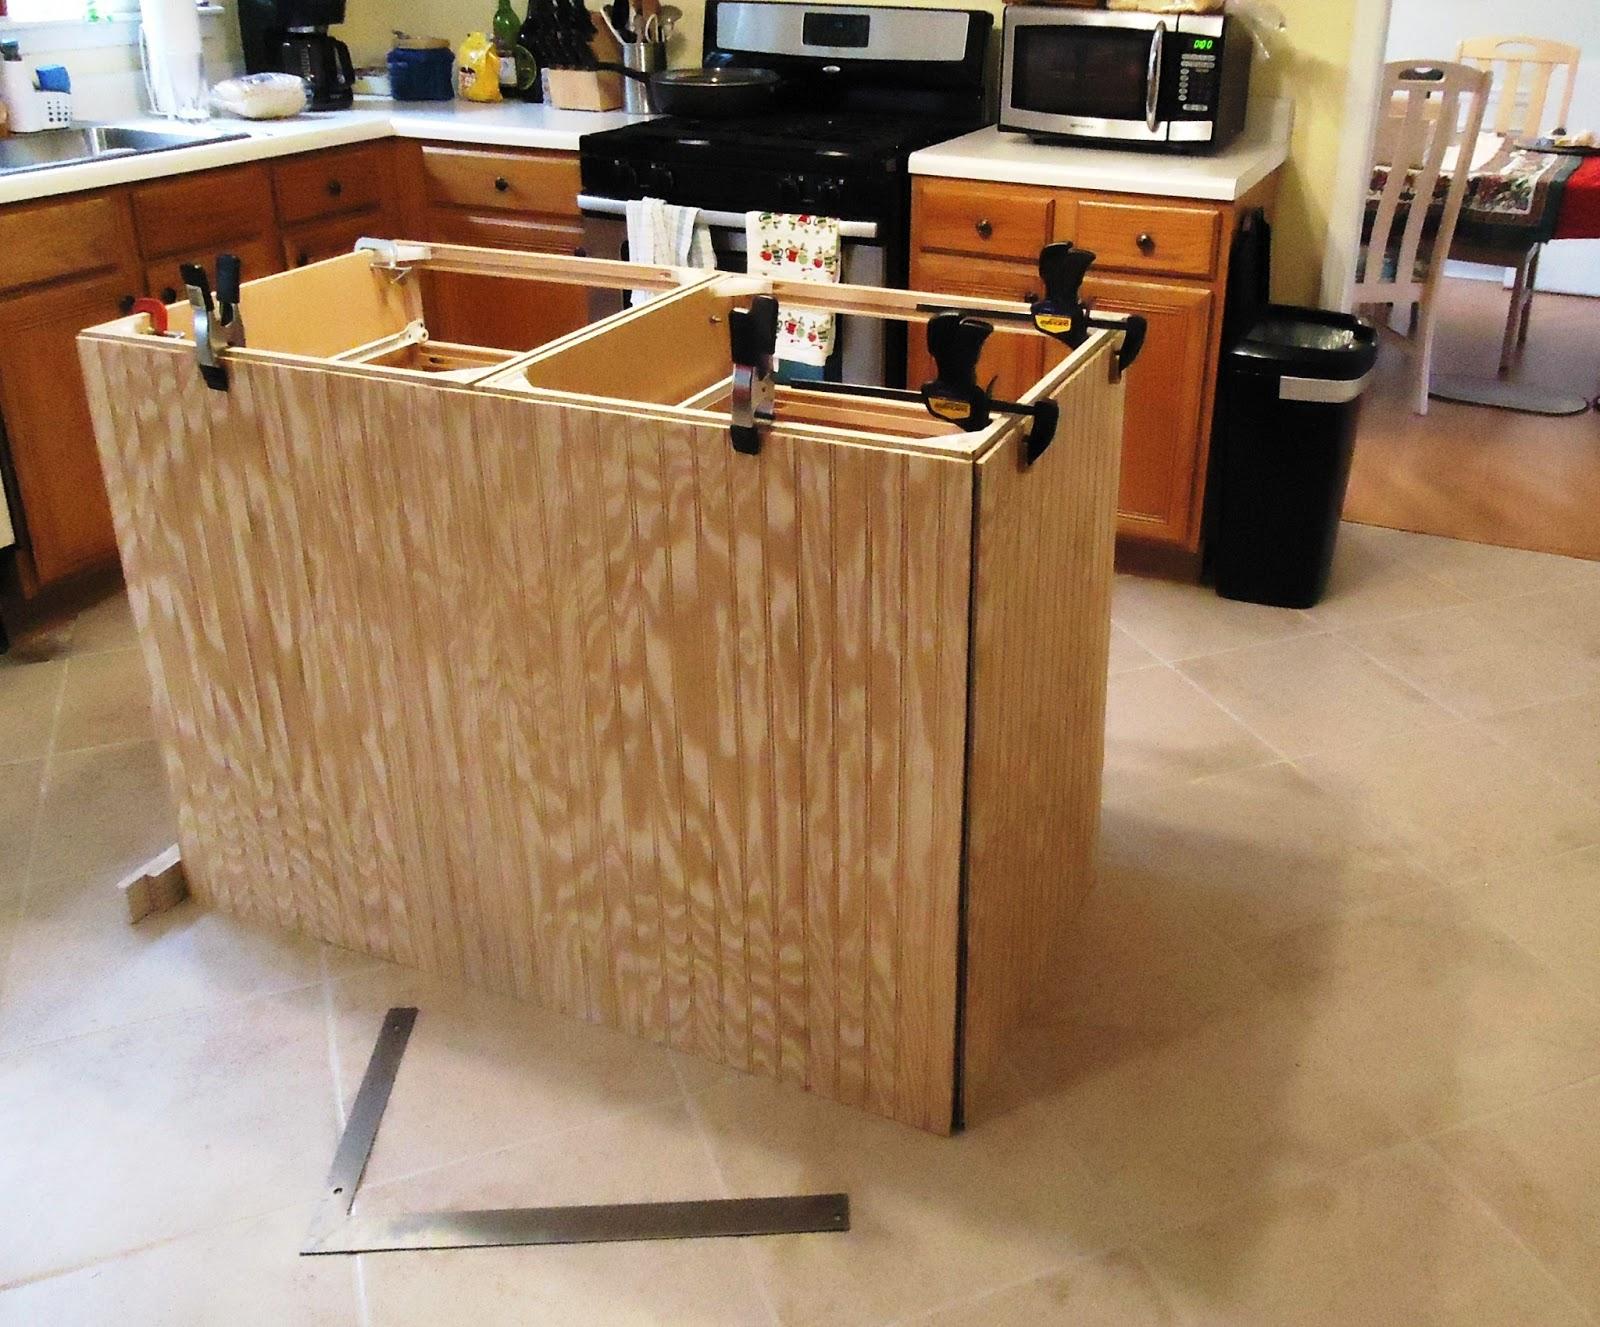 Home Depot Unfinished Base Cabinets